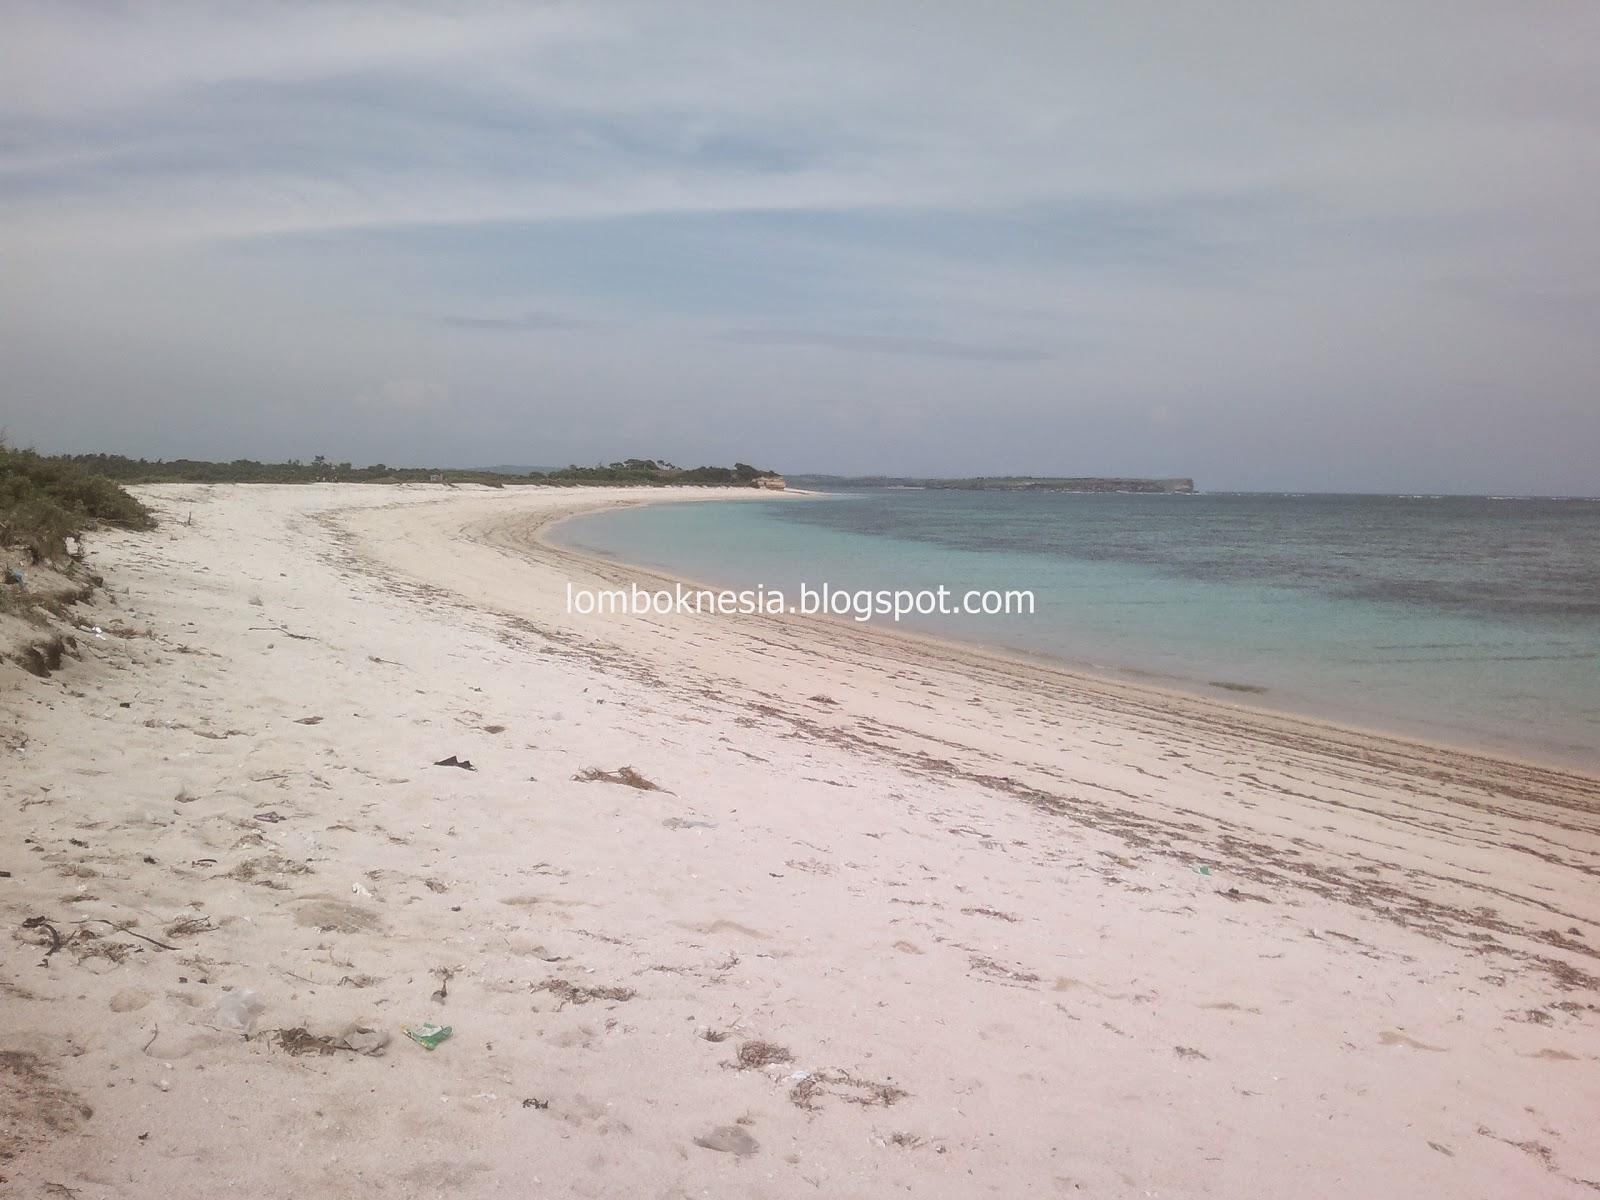 Explore Lombok 20 Tempat Tempat Wisata Pesona Alam Lombok Timur